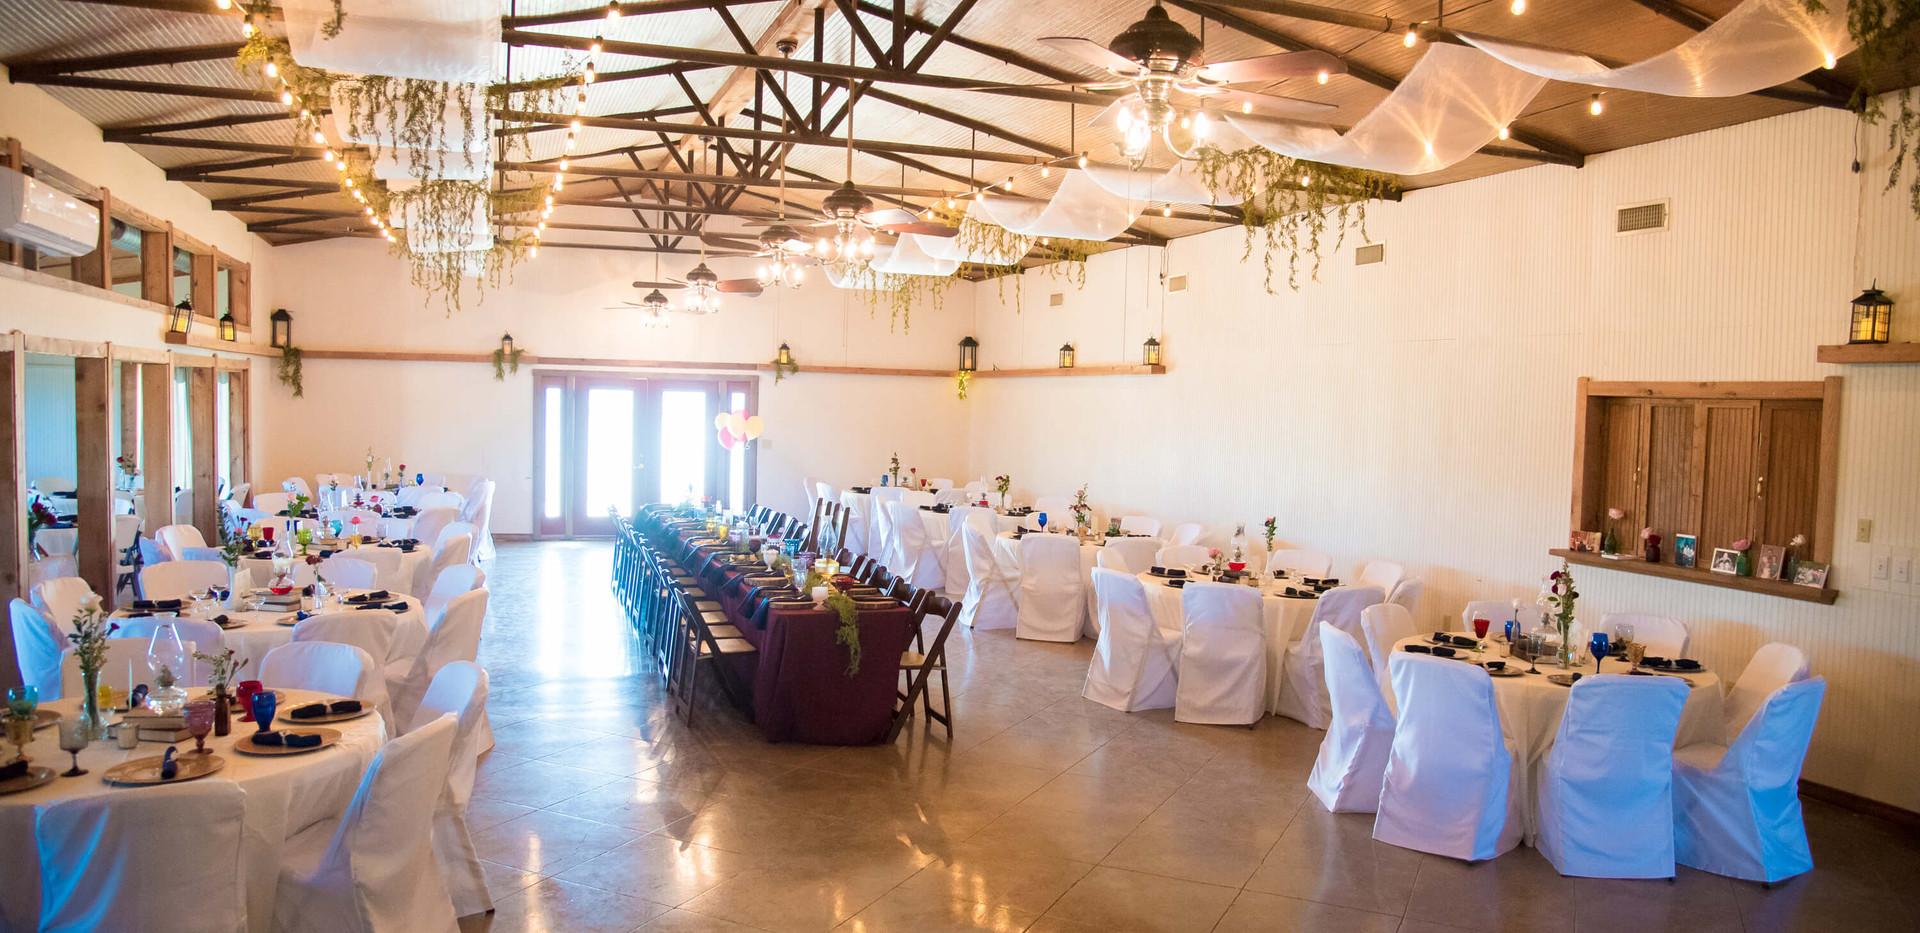 Wimberley Wedding Venue- Dining & Dance